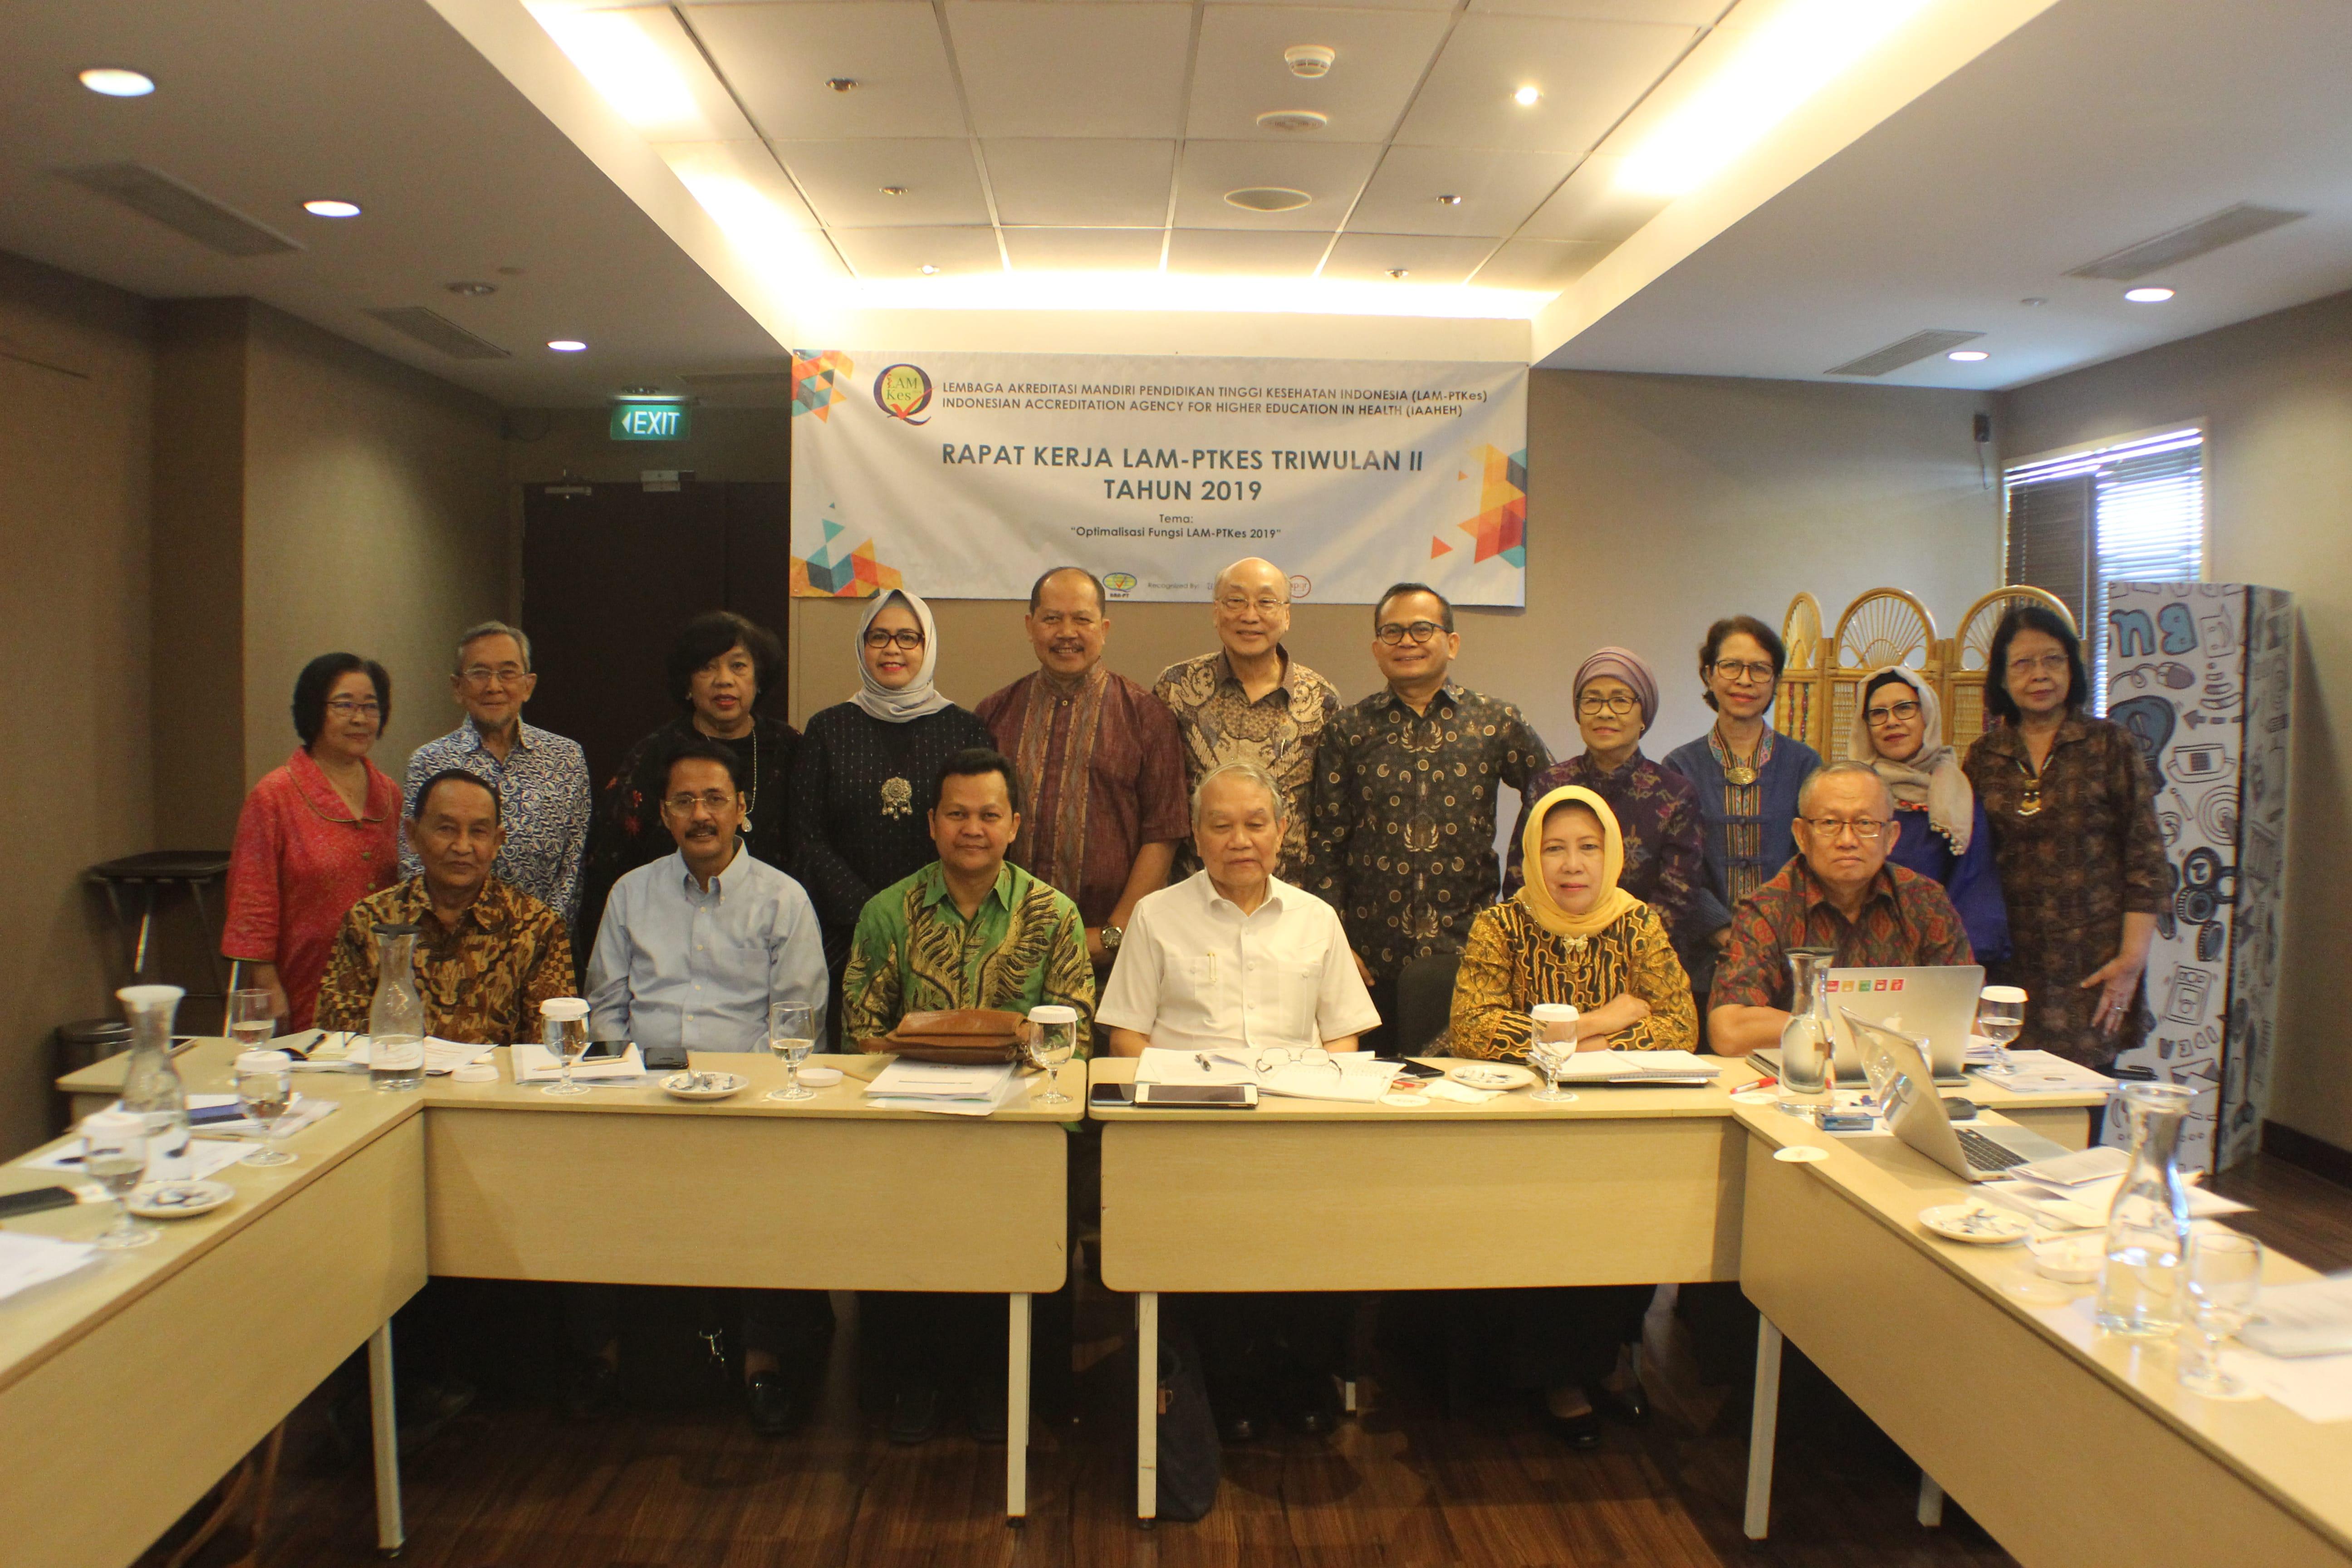 Rapat Kerja LAM-PTKes Triwulan II